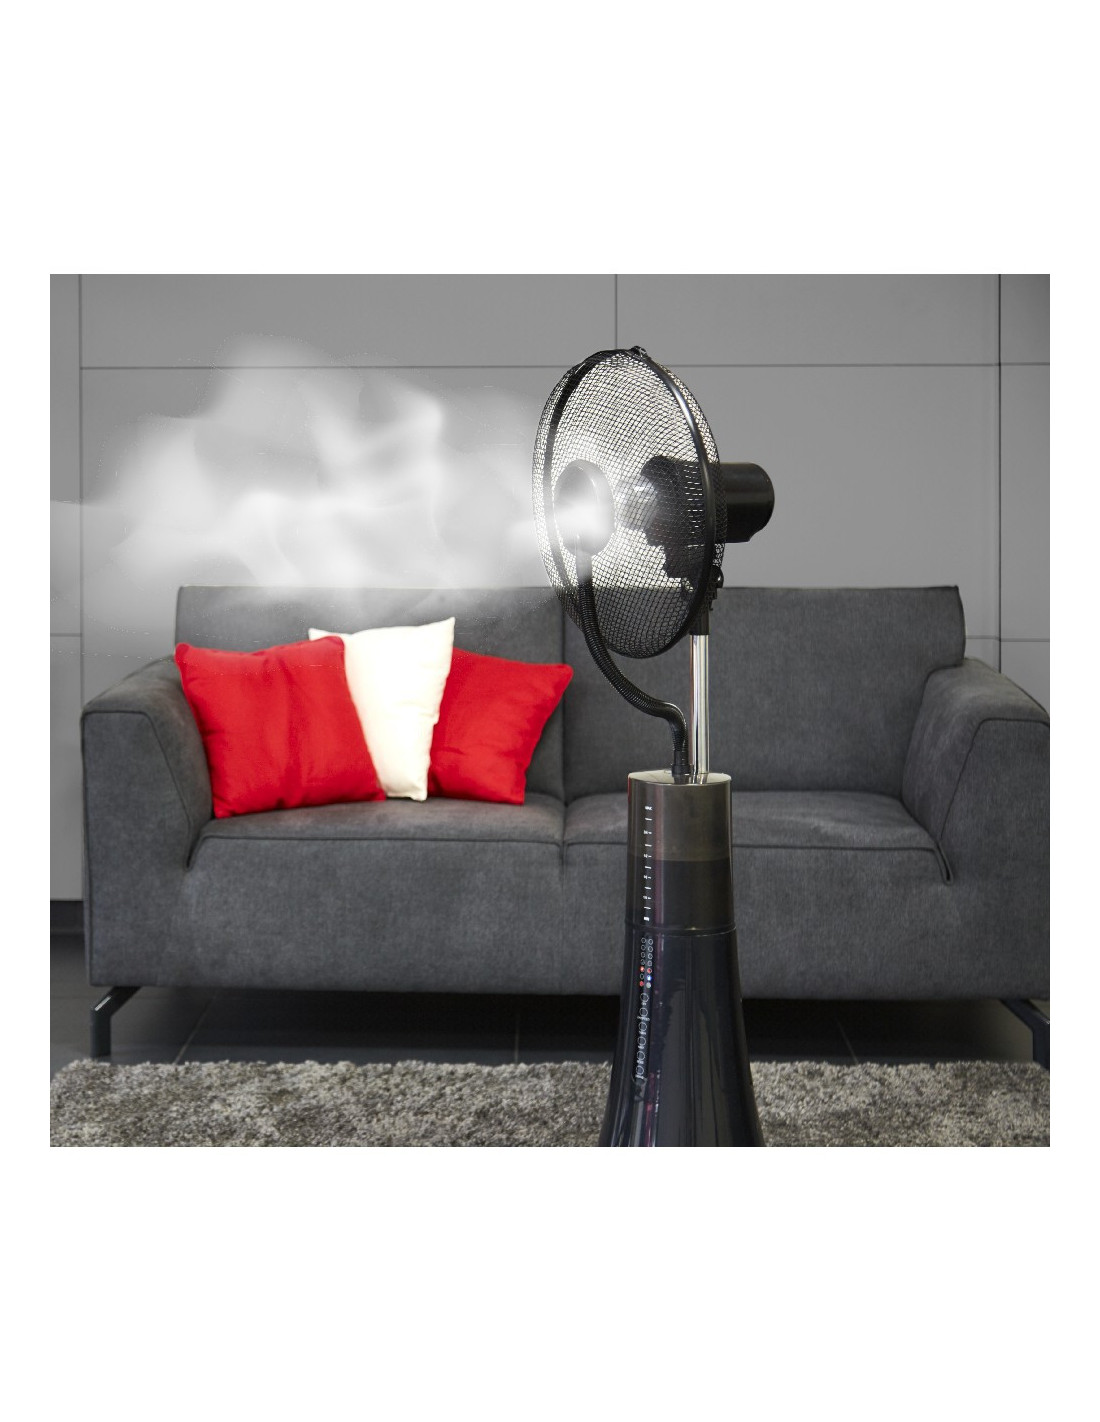 ventilateur brumisateur d intrieur beautiful brumisateur de terrasse leroy merlin avec. Black Bedroom Furniture Sets. Home Design Ideas